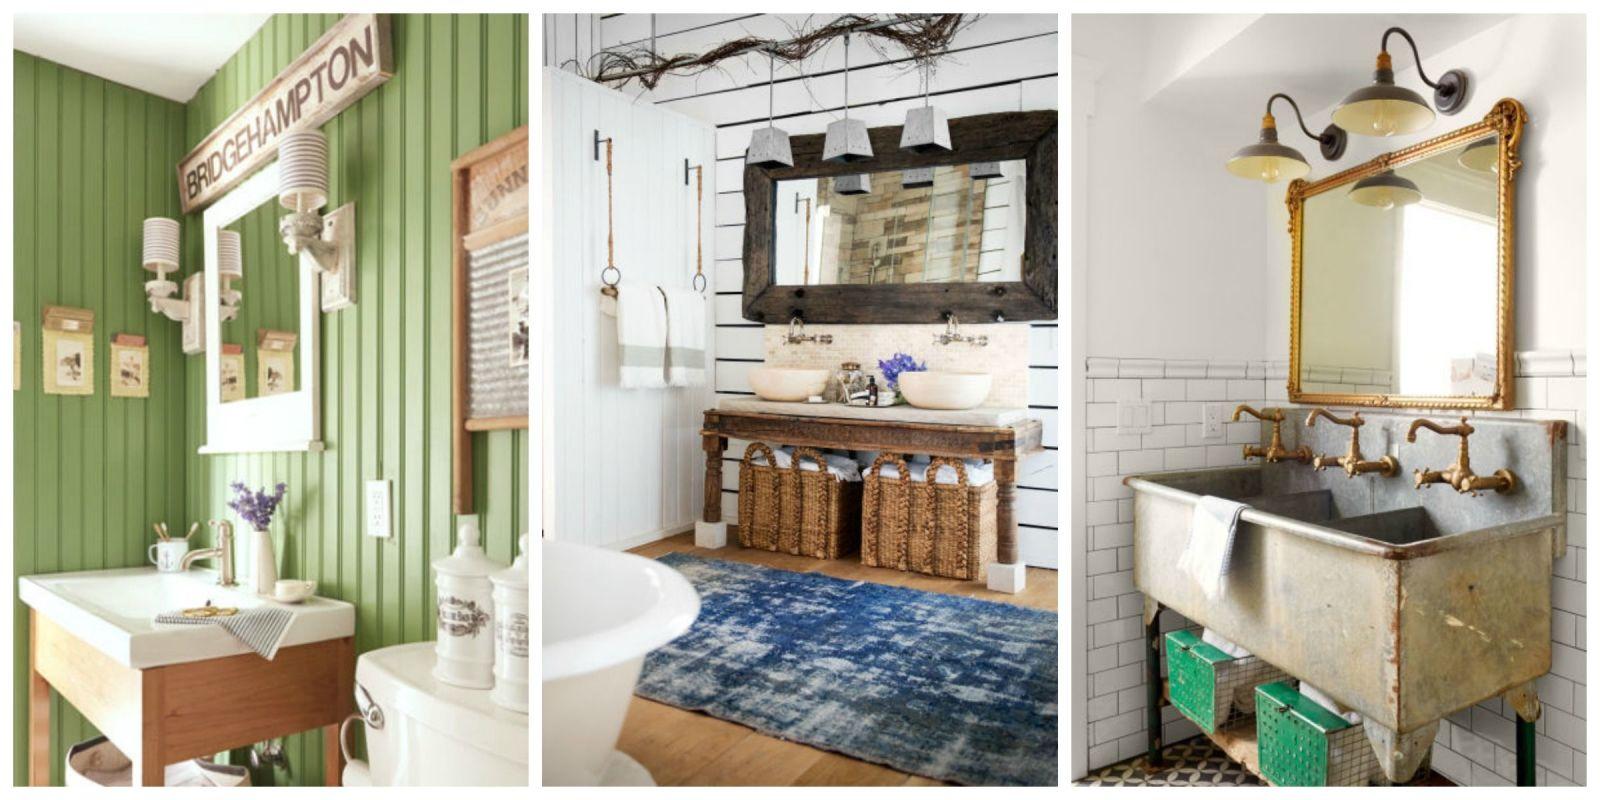 free home decorating ideas photos - 90 Best Bathroom Decorating Ideas Decor & Design